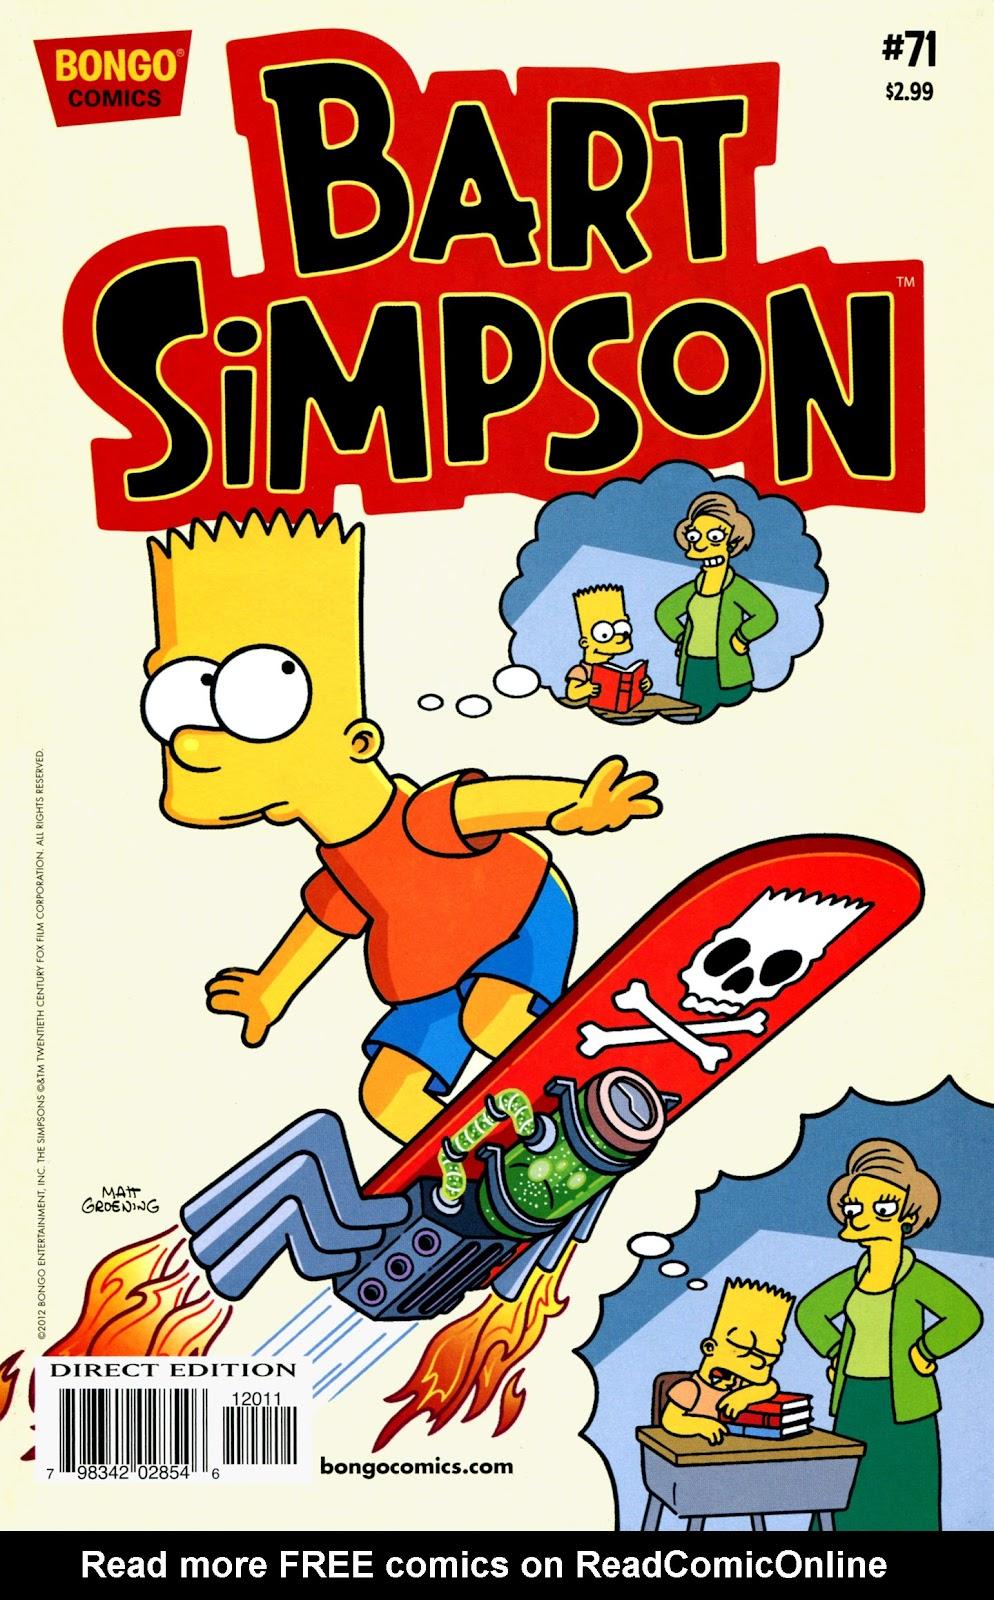 Simpsons Comics Presents Bart Simpson 71 Page 1